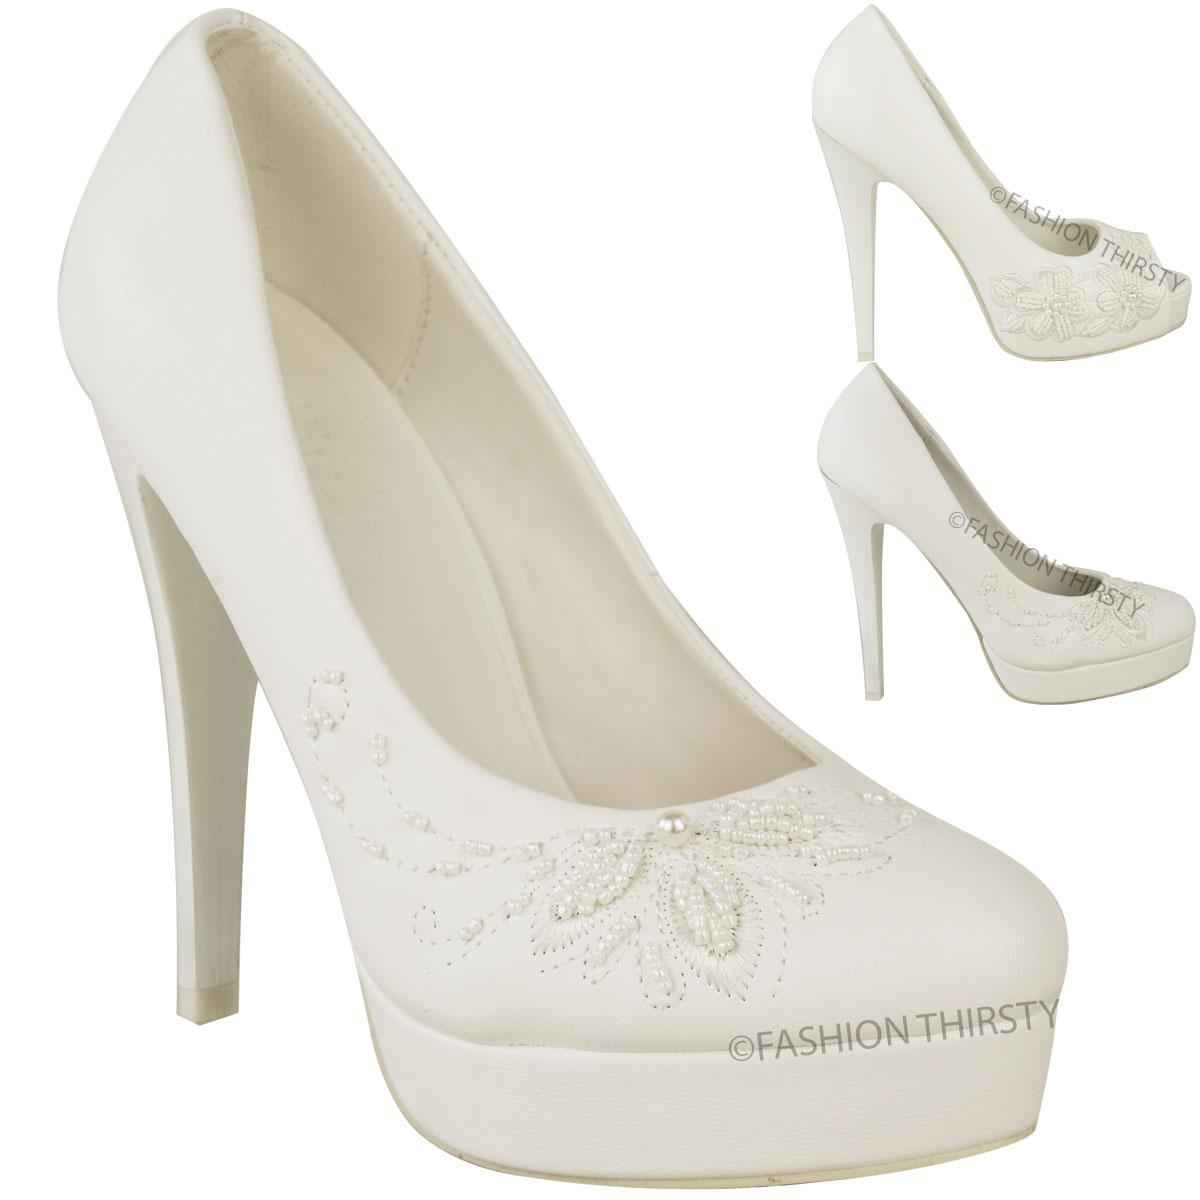 Womens Ladies Wedding Bridal High Heel White Shoes Stilettos Platforms Prom Size